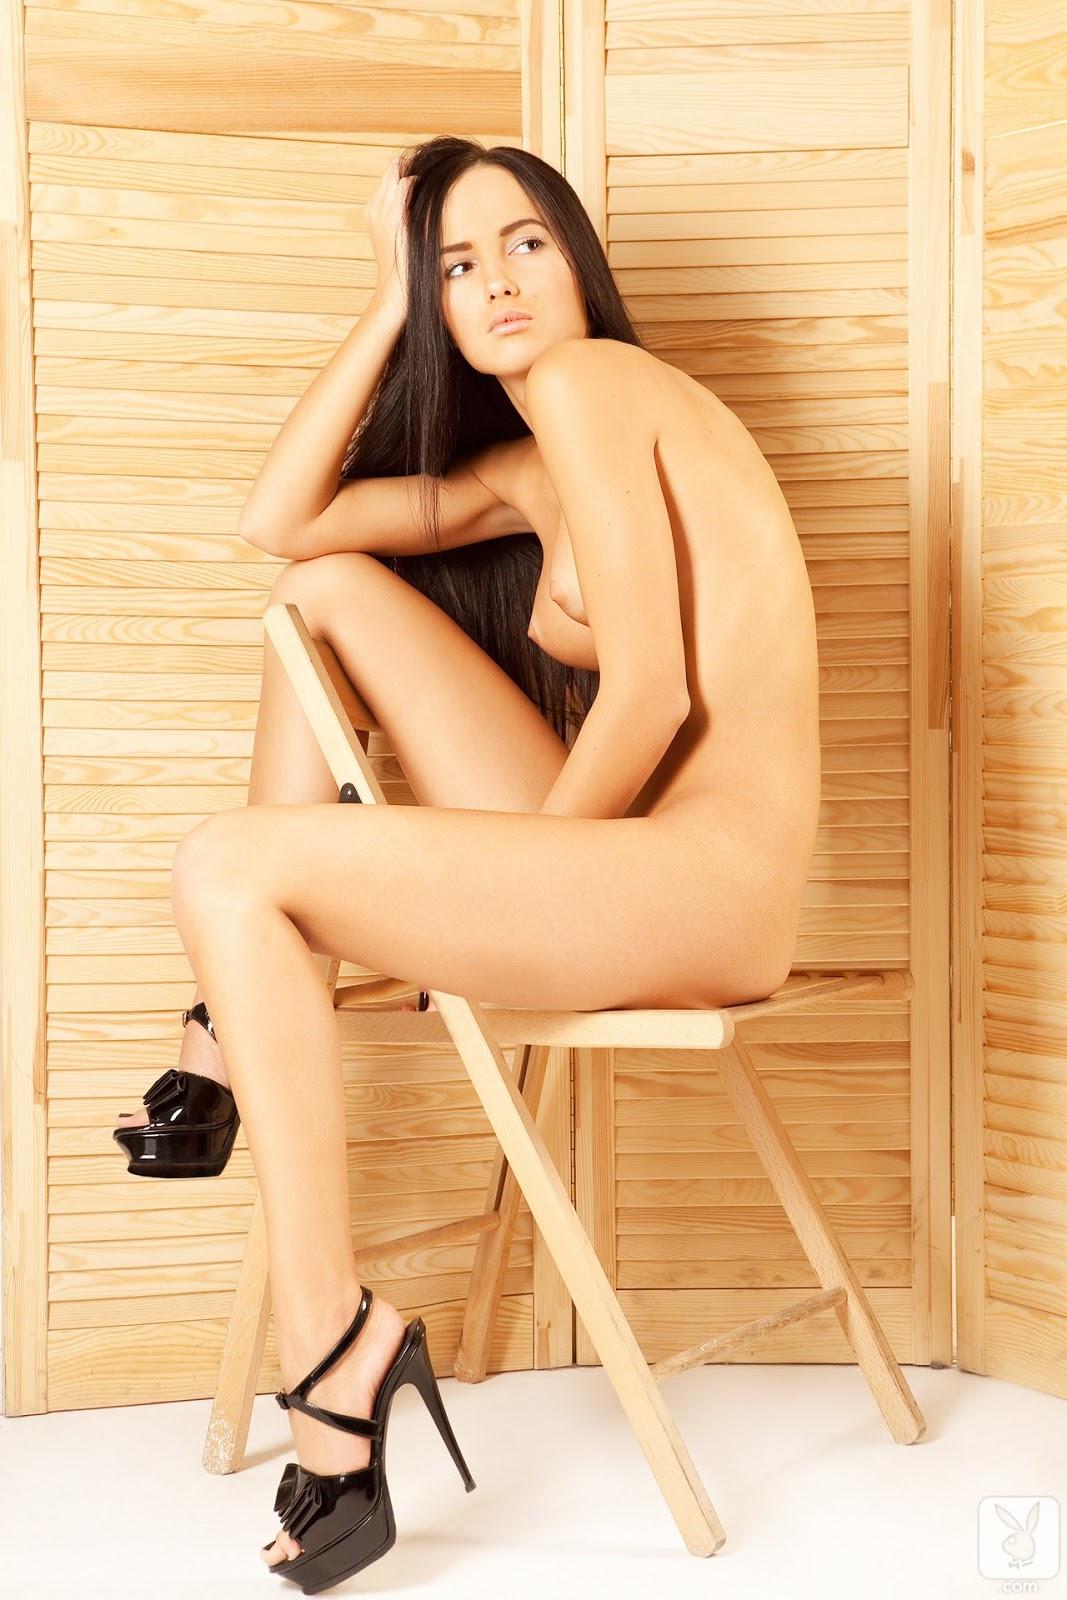 eroticheskie-fotki-dashi-bondarenko